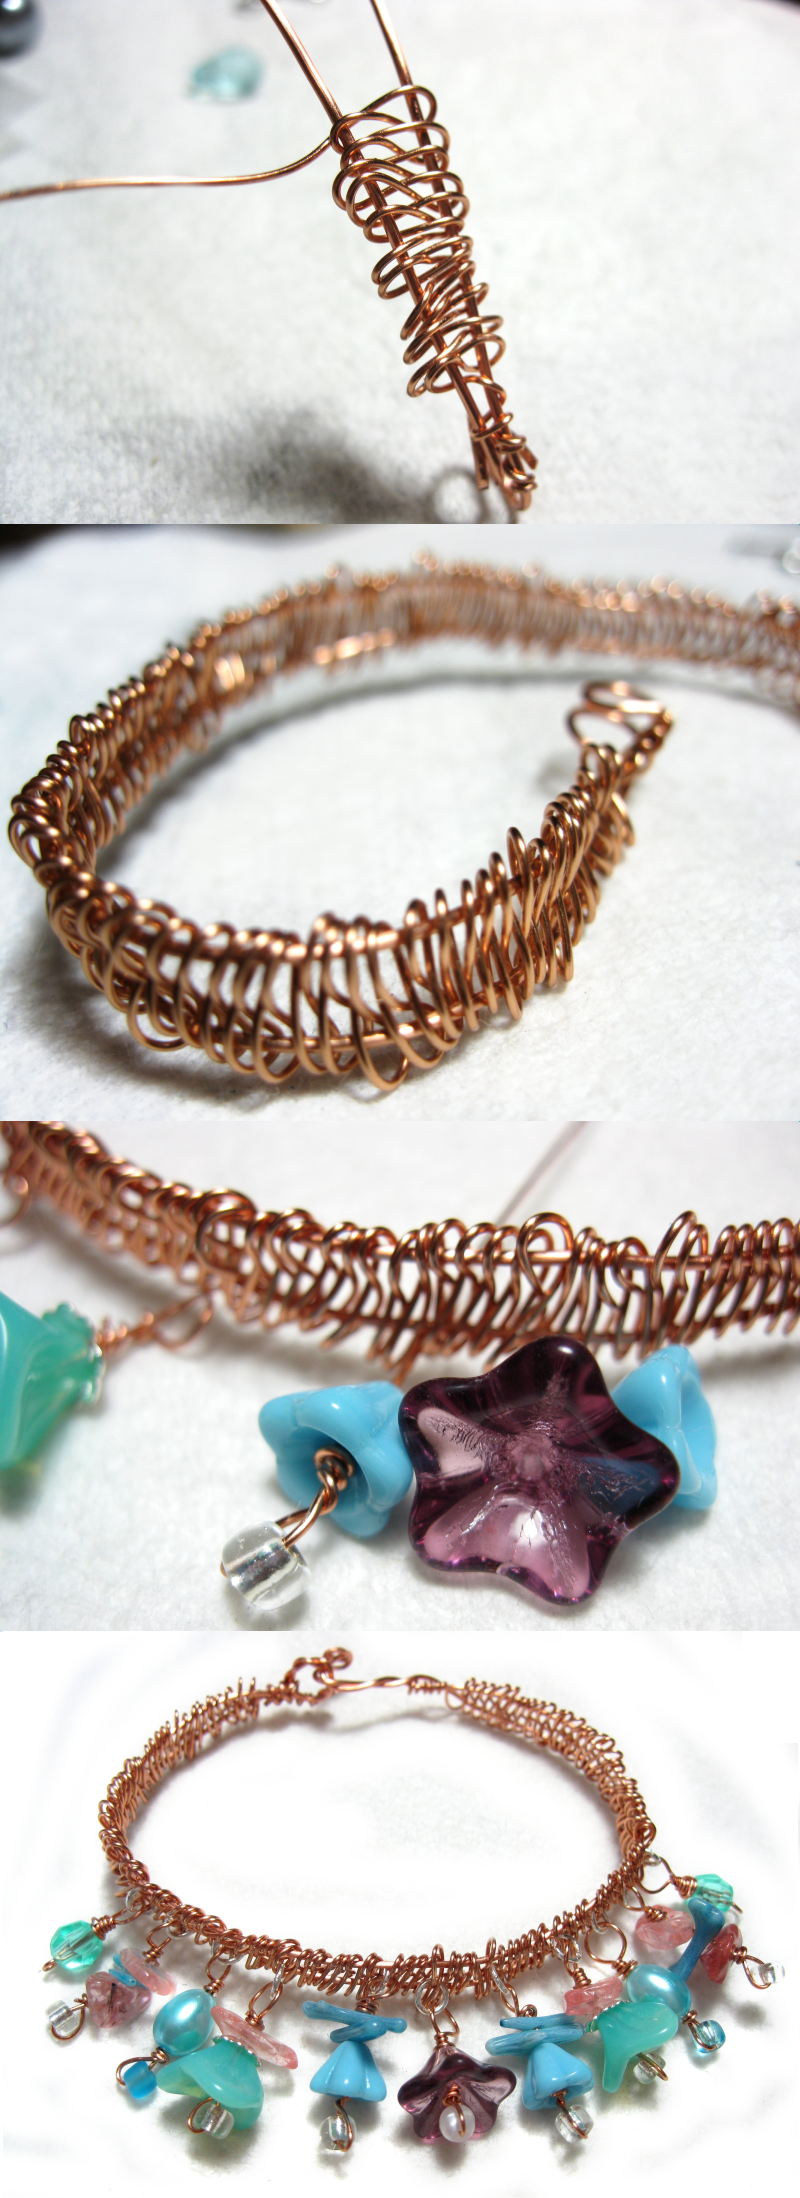 Copper Bracelet Tutorial by AtlantisAK-Jewelry